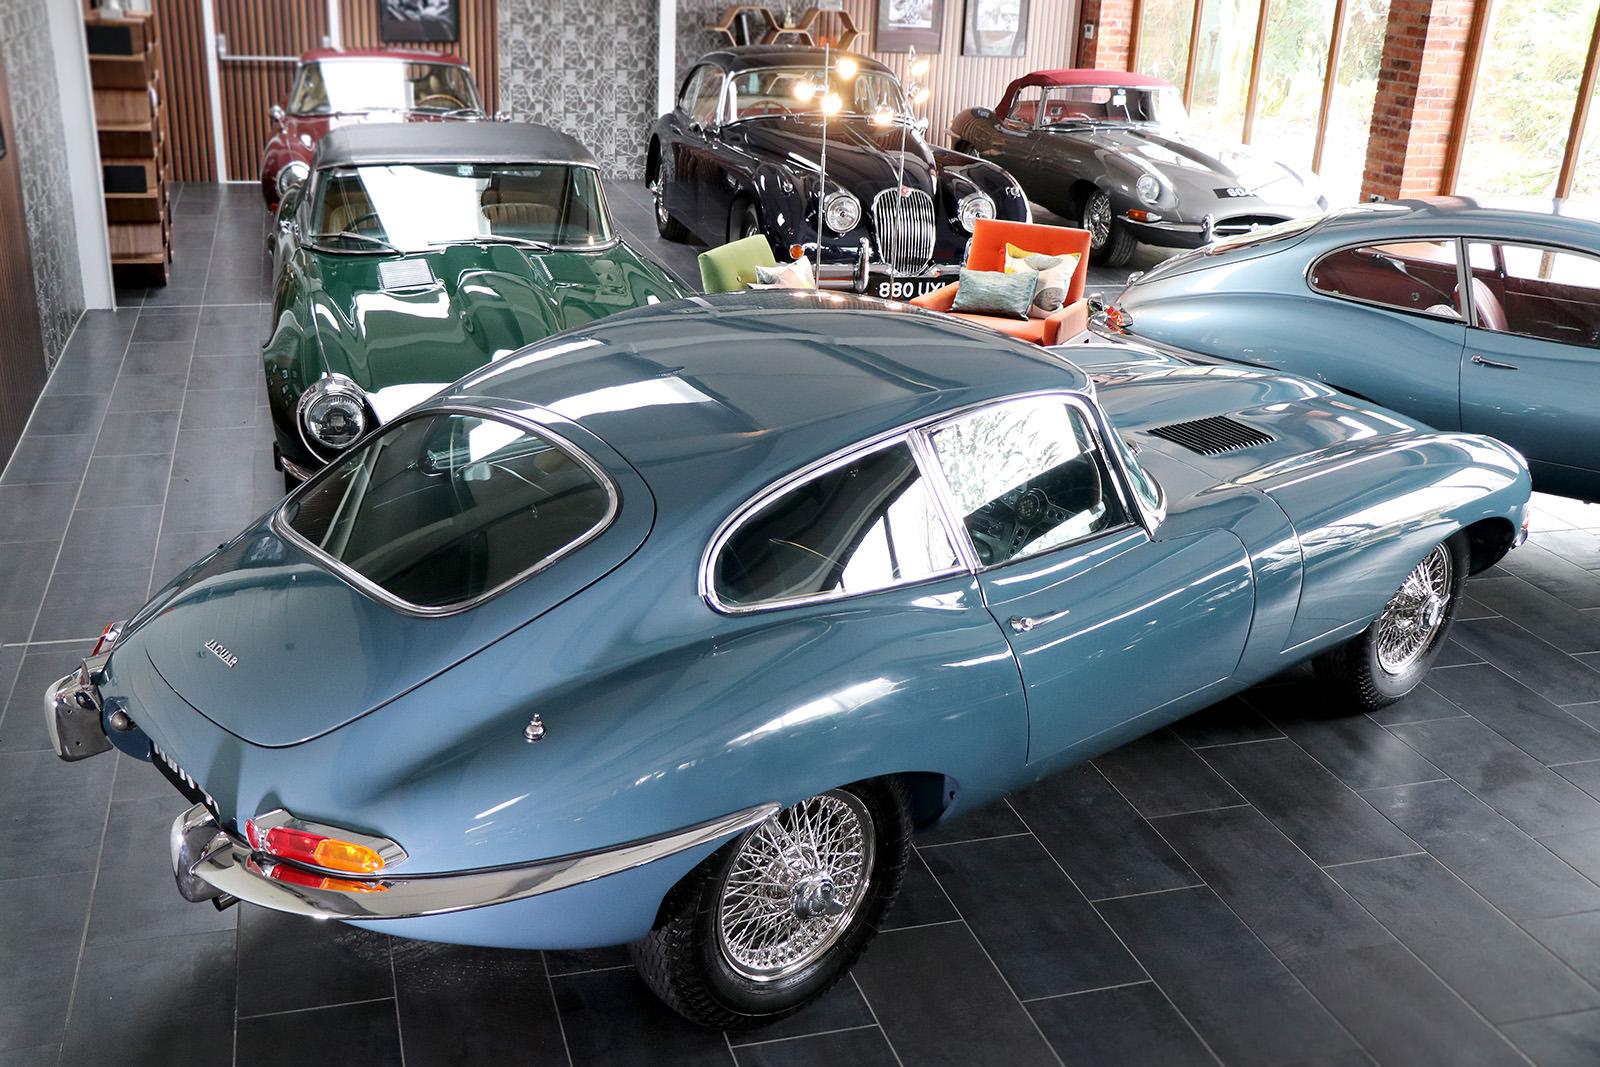 1963_cotswold_blue_series 1_jaguar_etype_sayer_selection_wilkinson_web_1.jpg